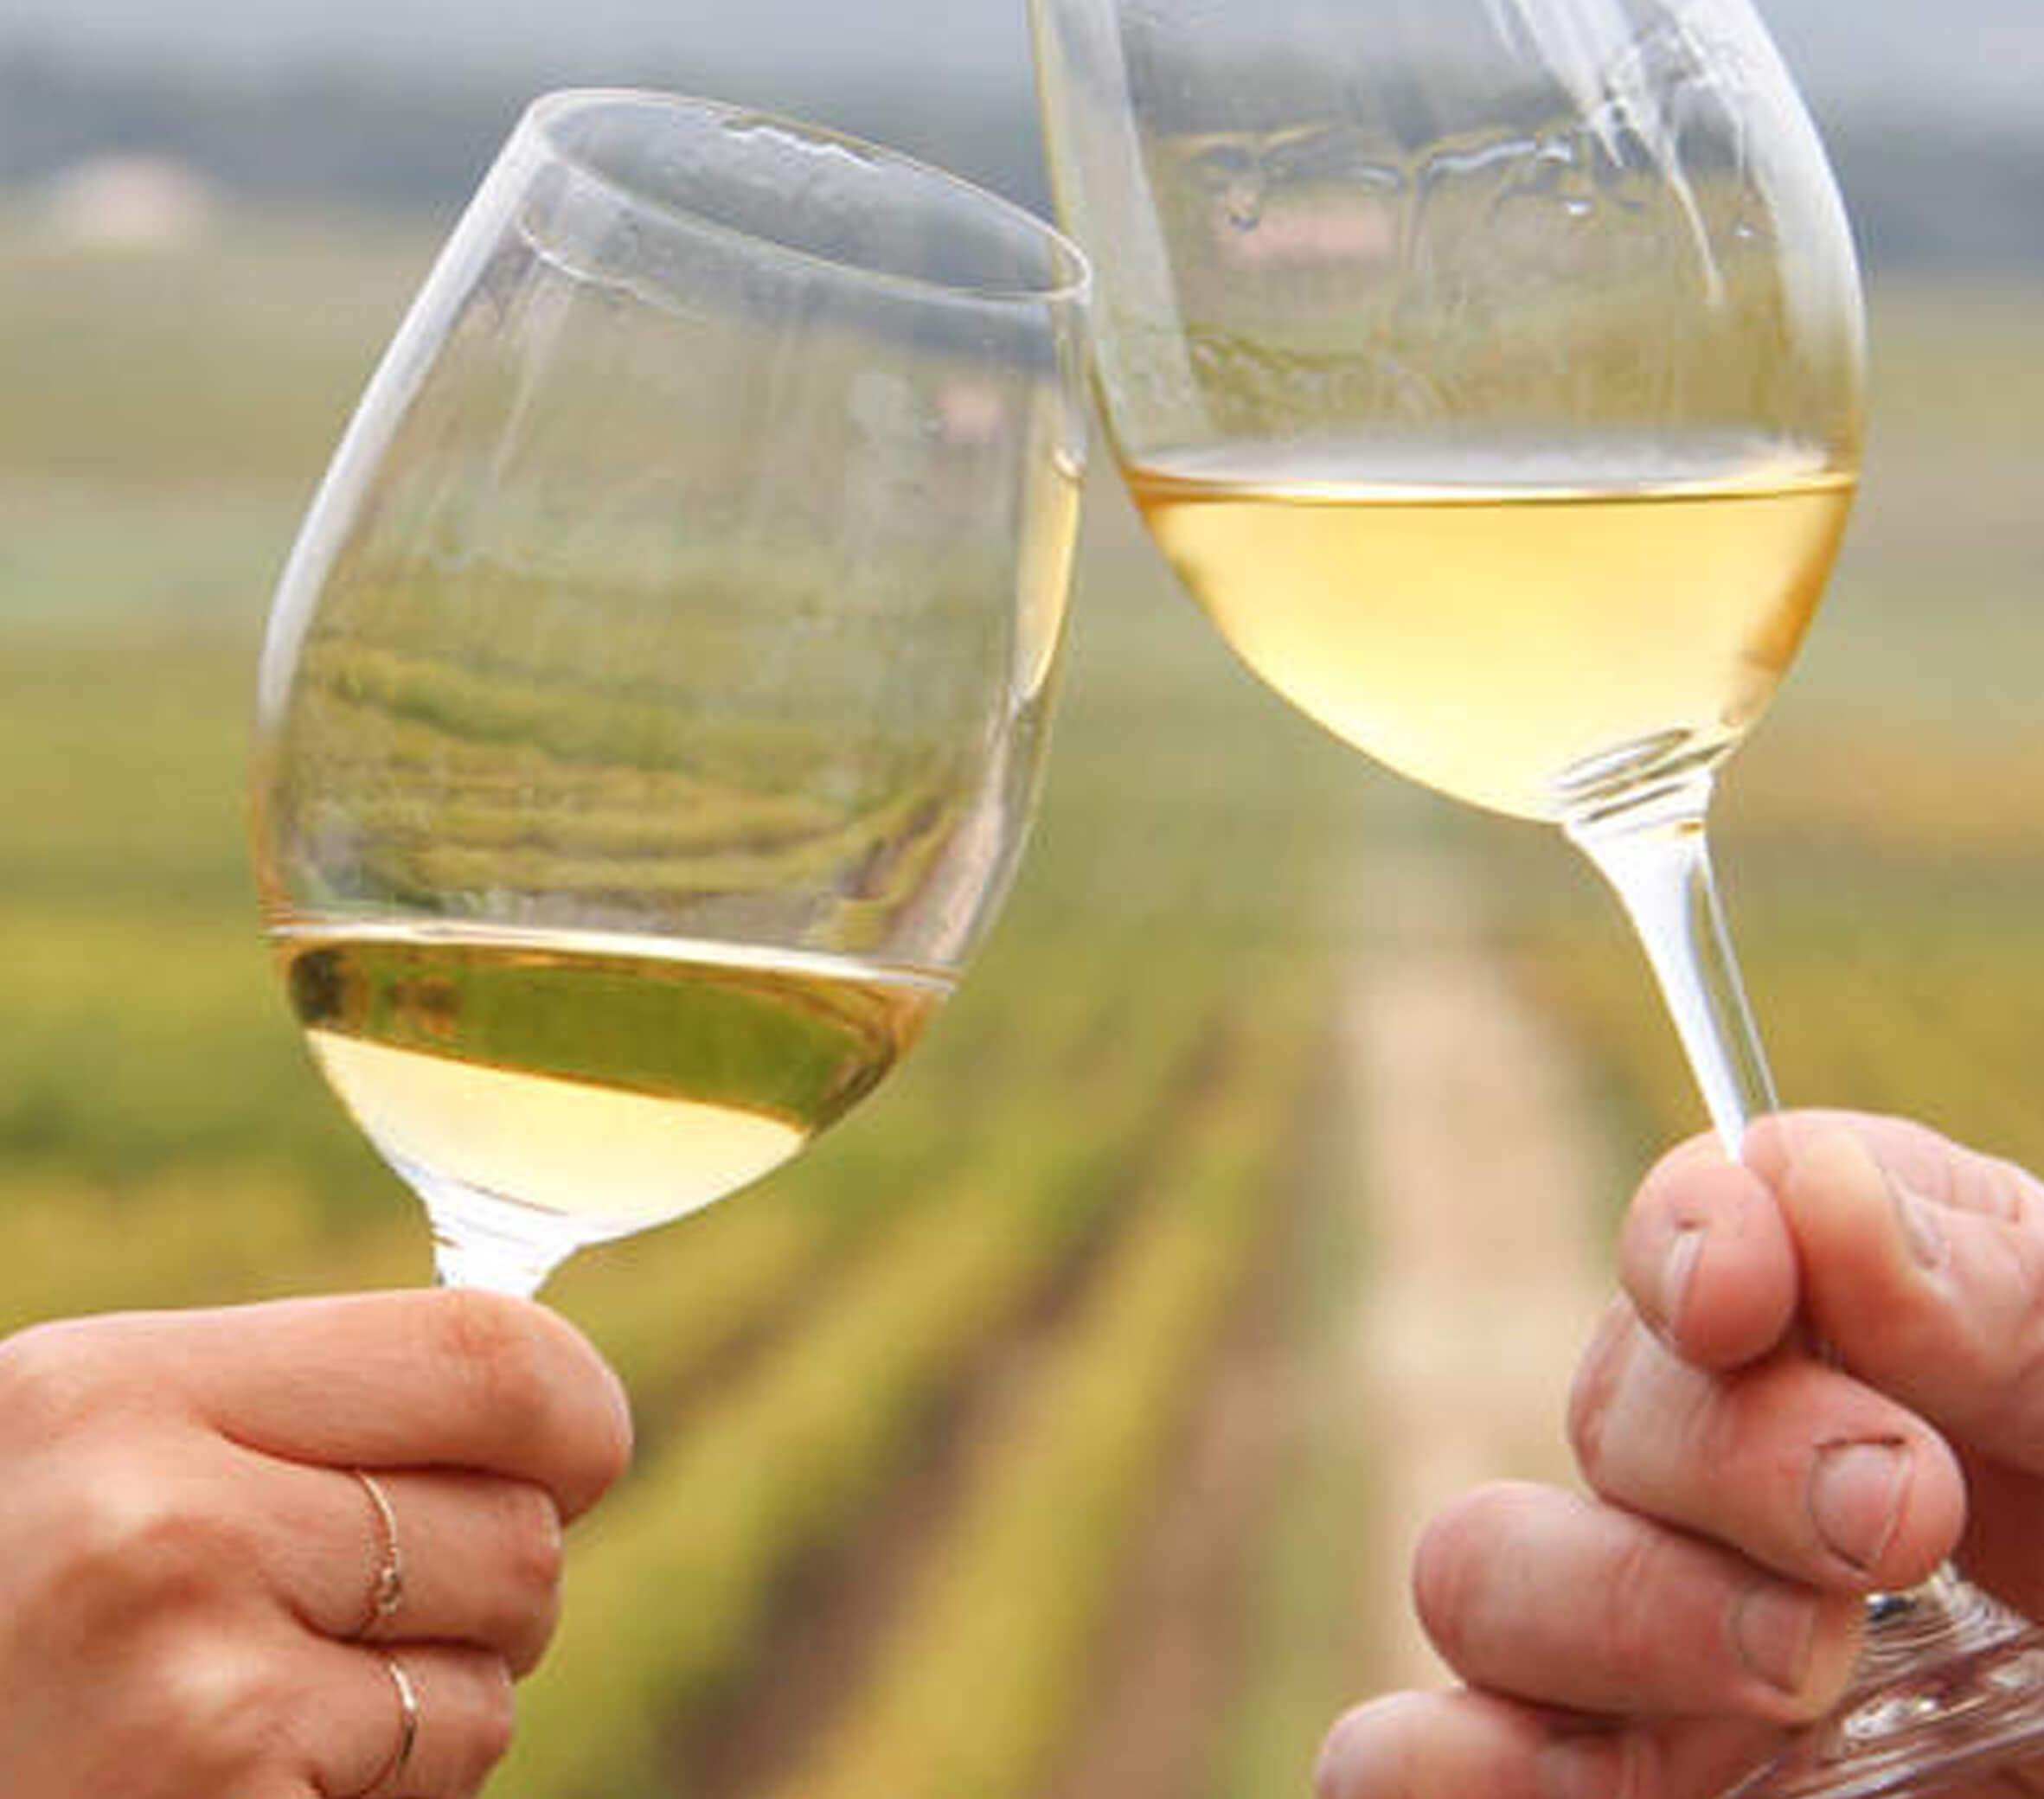 Legendary white bordeaux wine